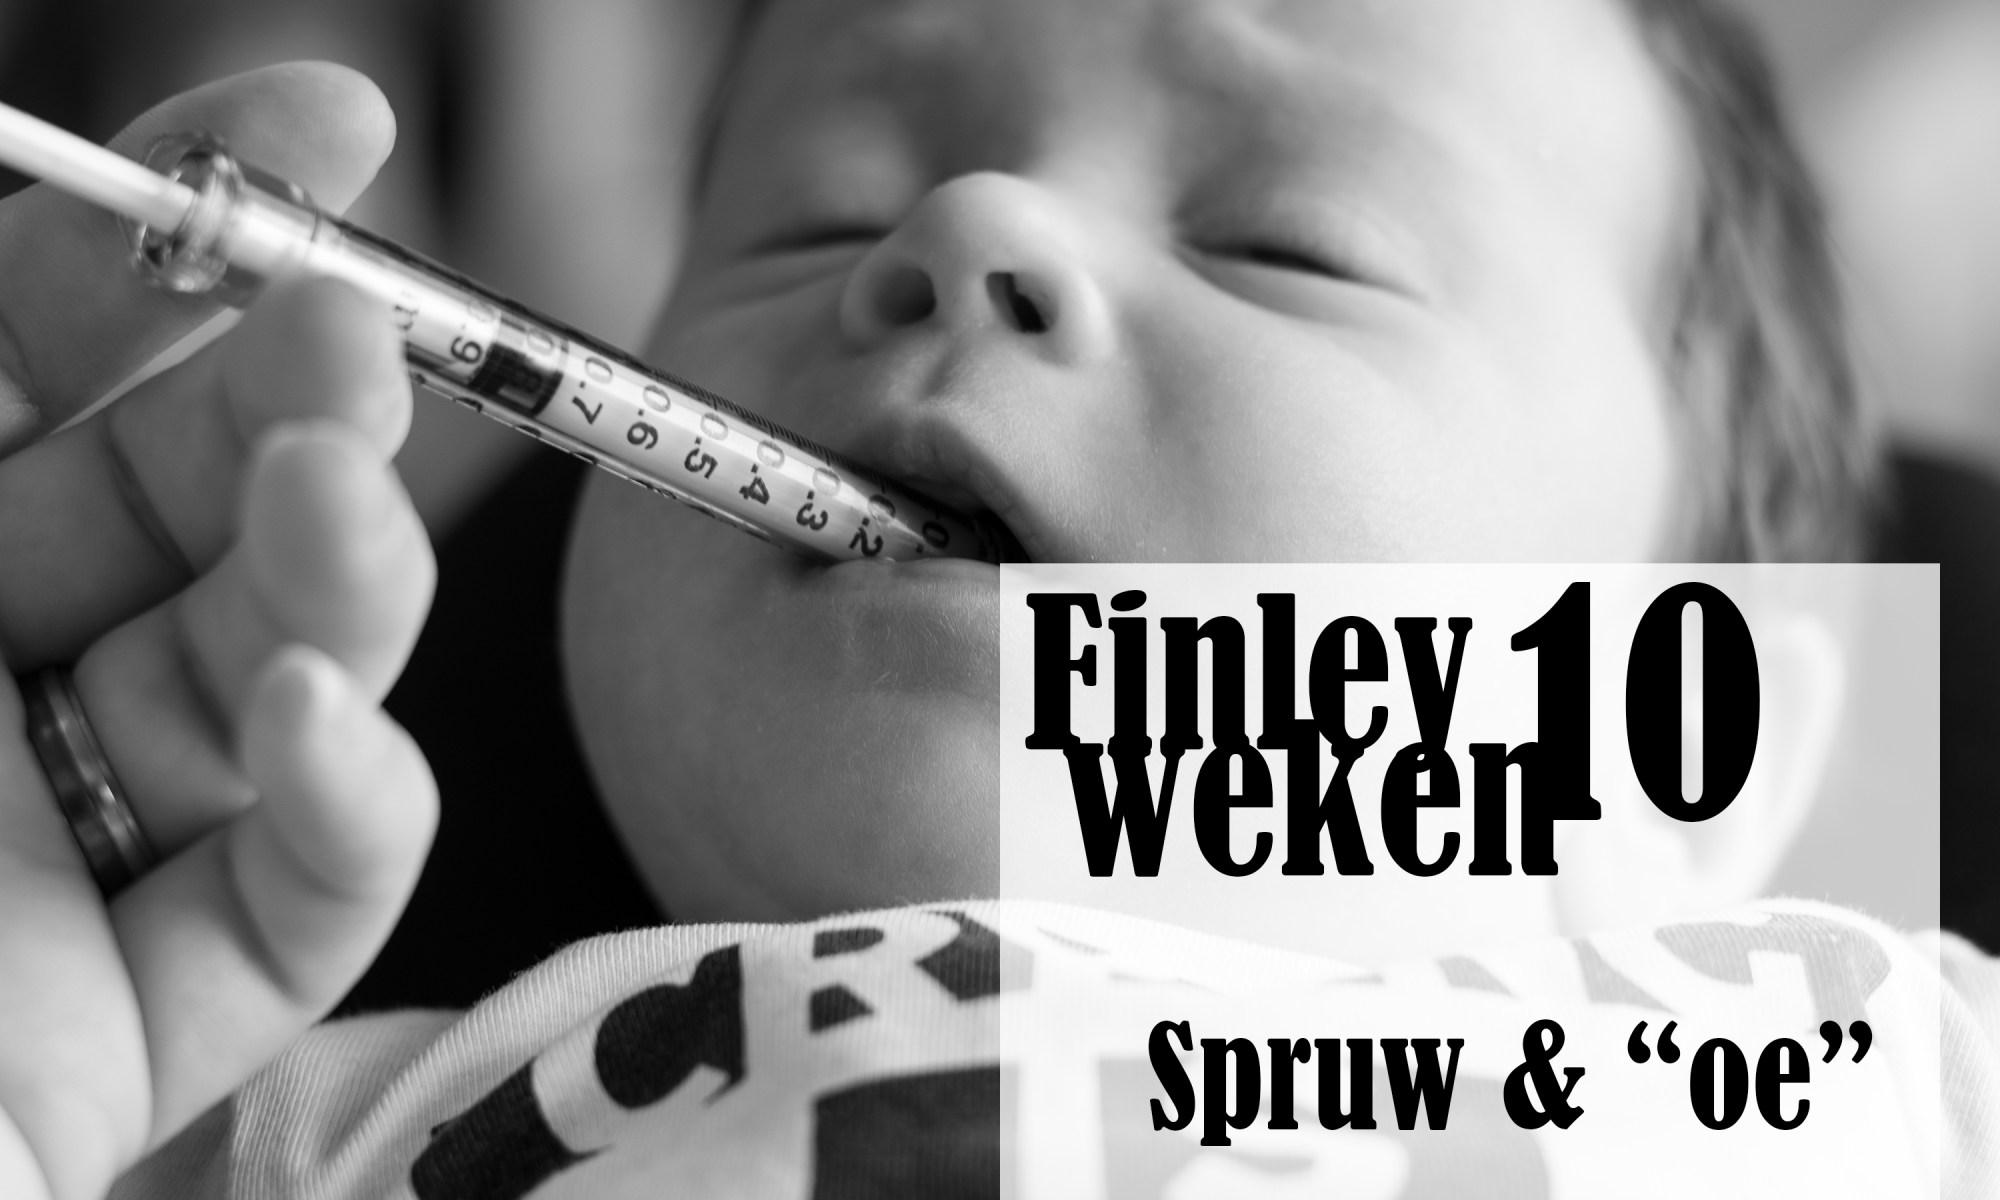 Finley 10 weken oud spruw 4moms mamaroo baby newborn ontwikkeling borstvoeding lachen babbelen mama blog www.liefkleinwonder.nl